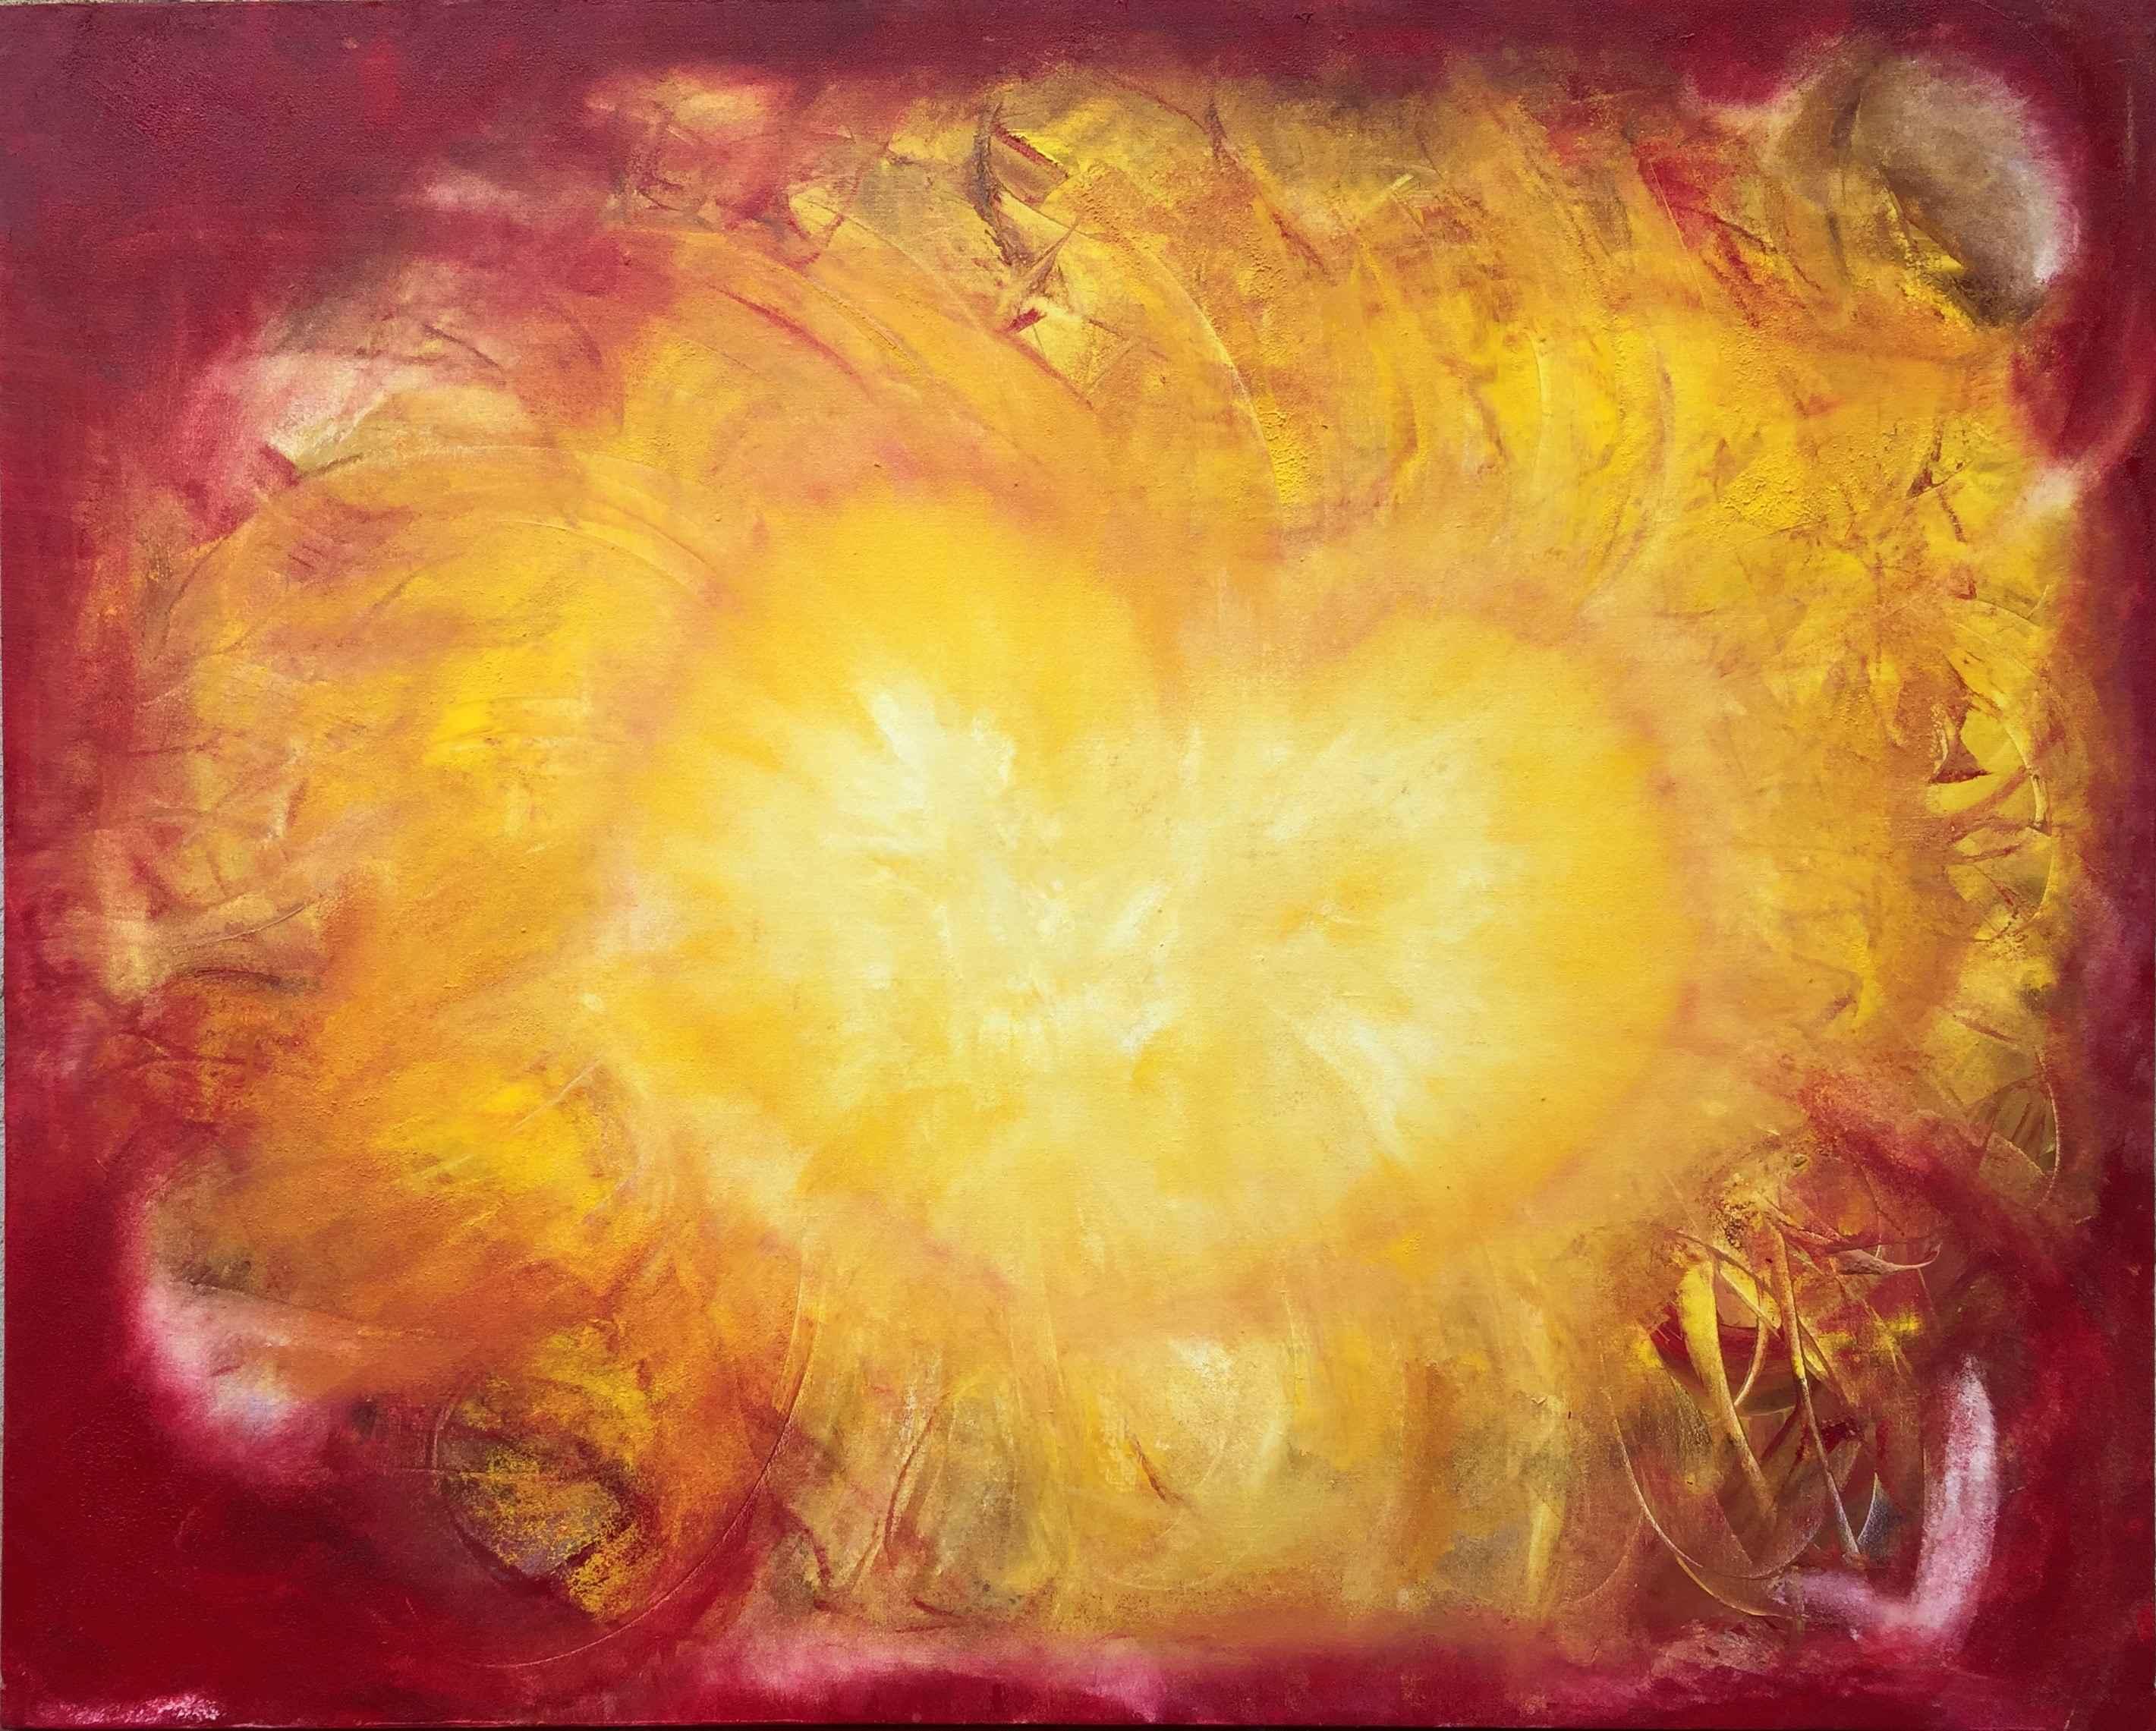 Alchimie by  Shireen PHARAONY - Masterpiece Online